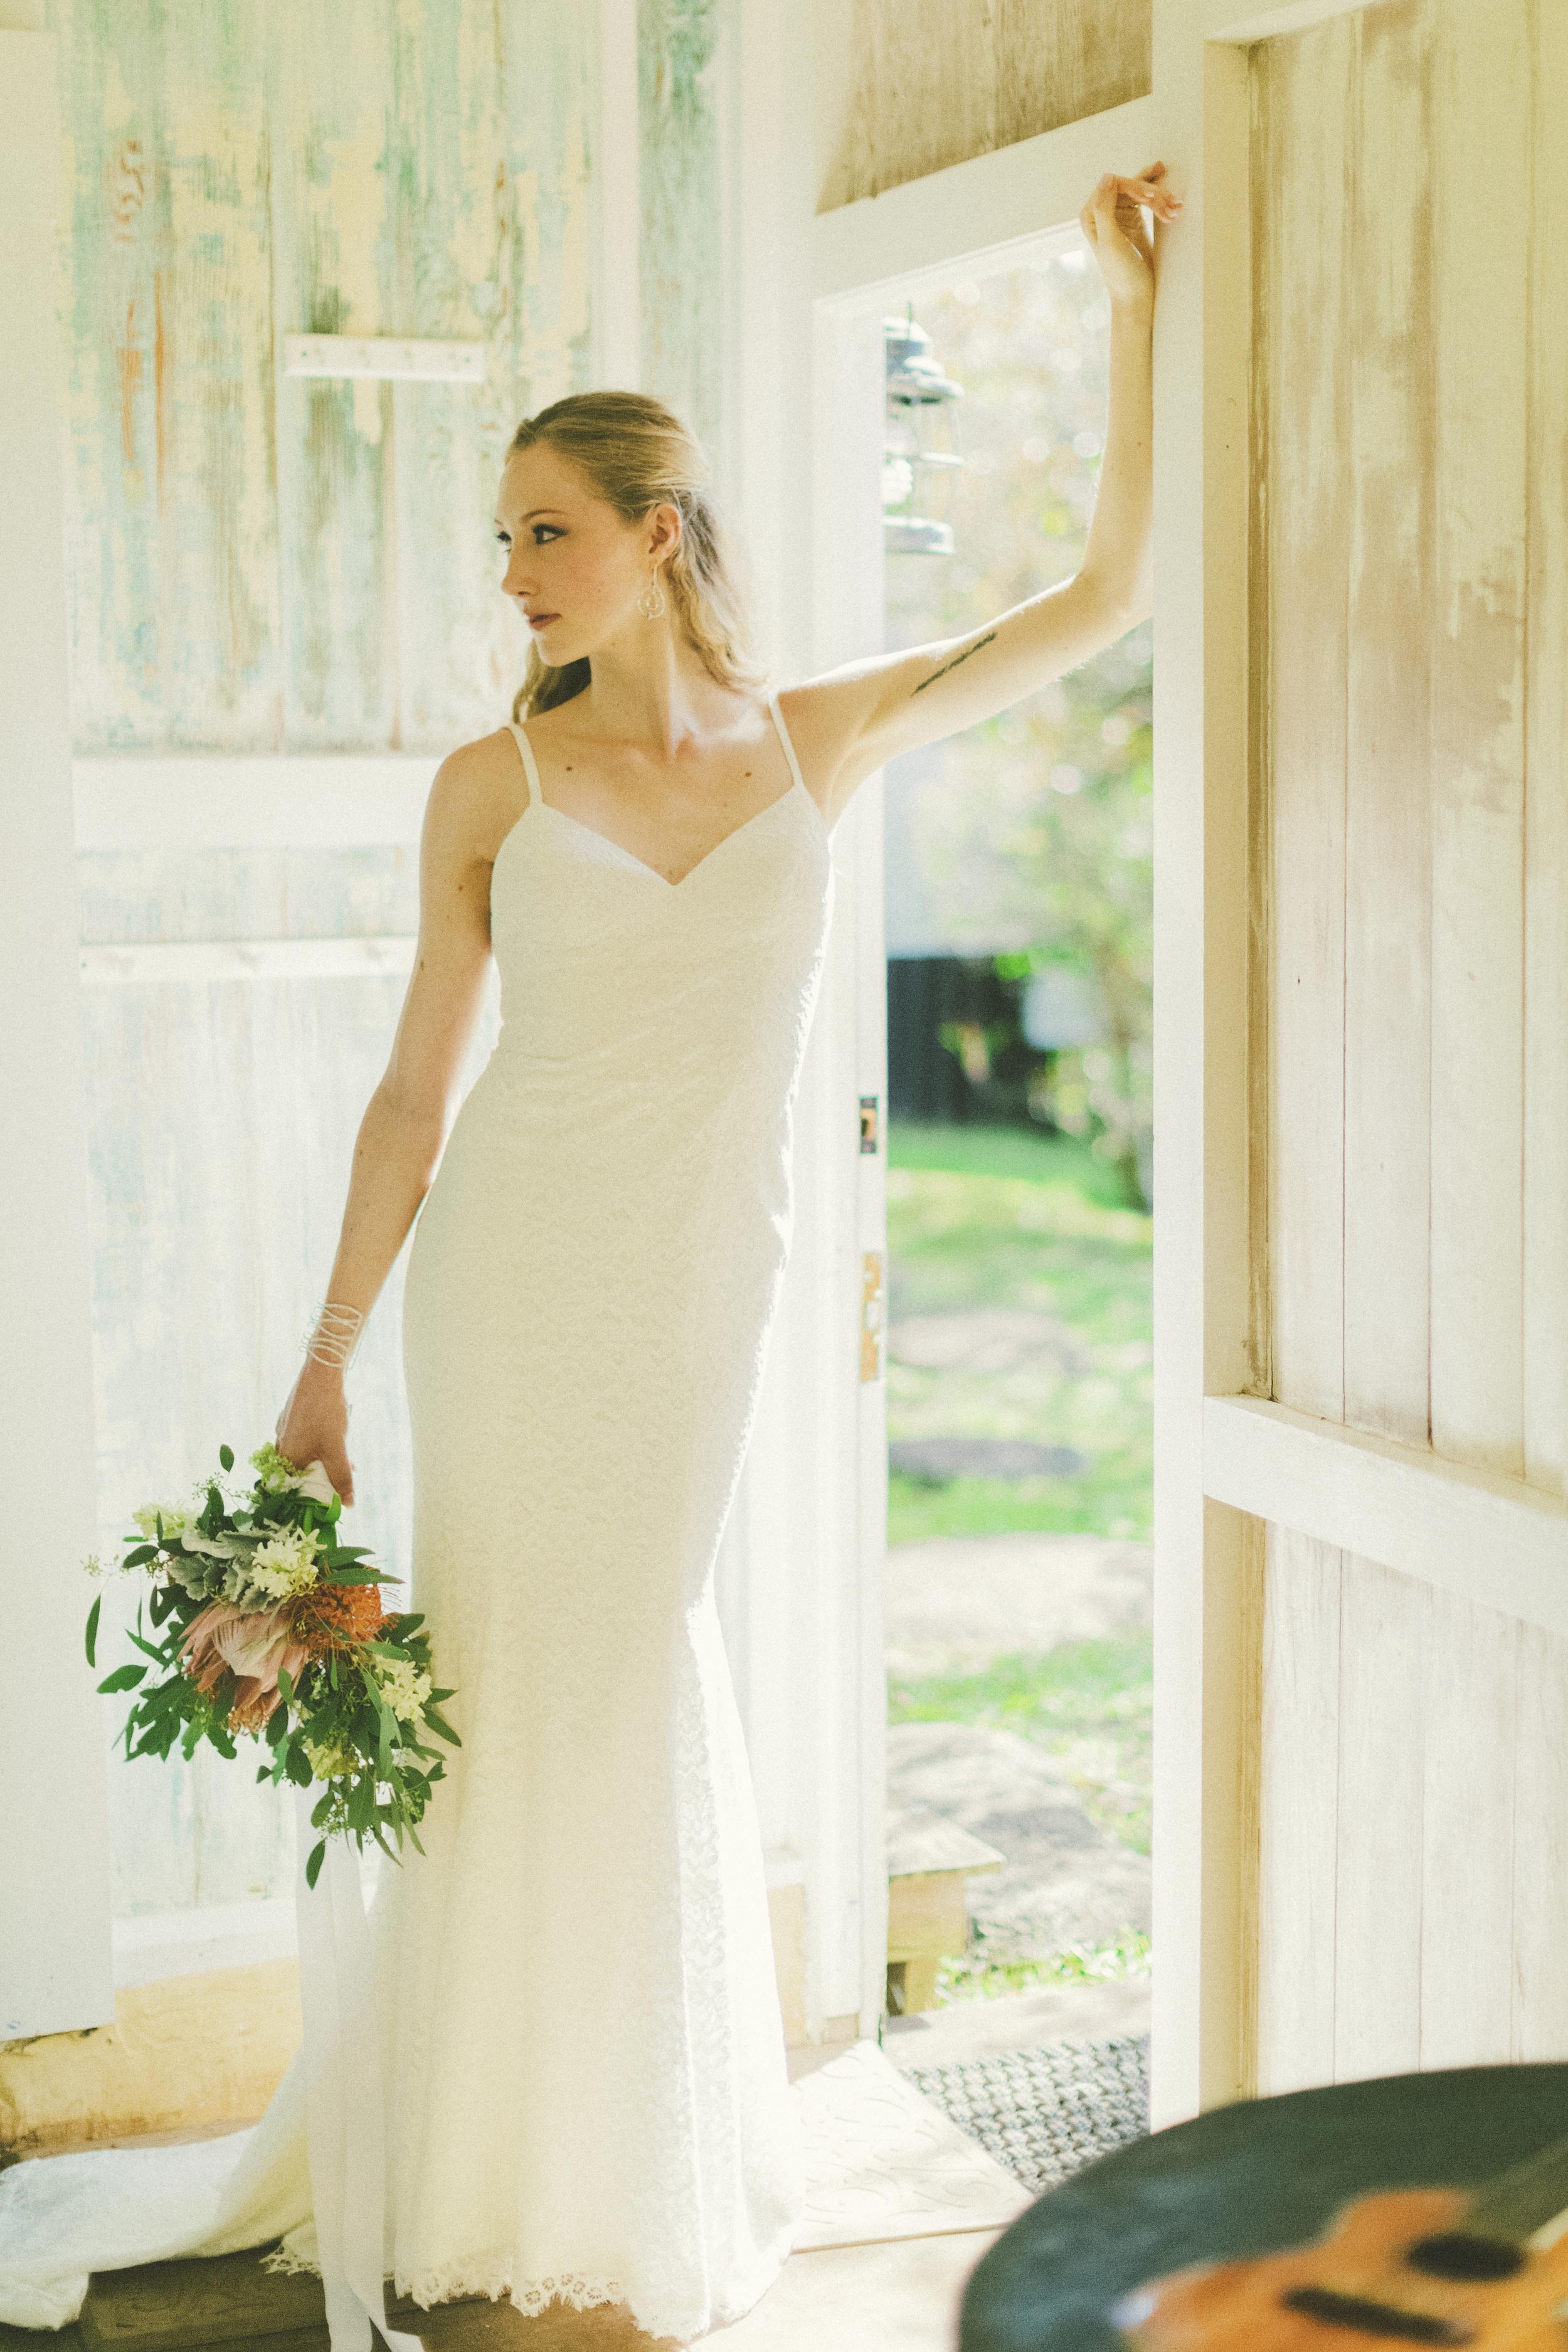 angie-diaz-photography-maui-wedding-41.jpg